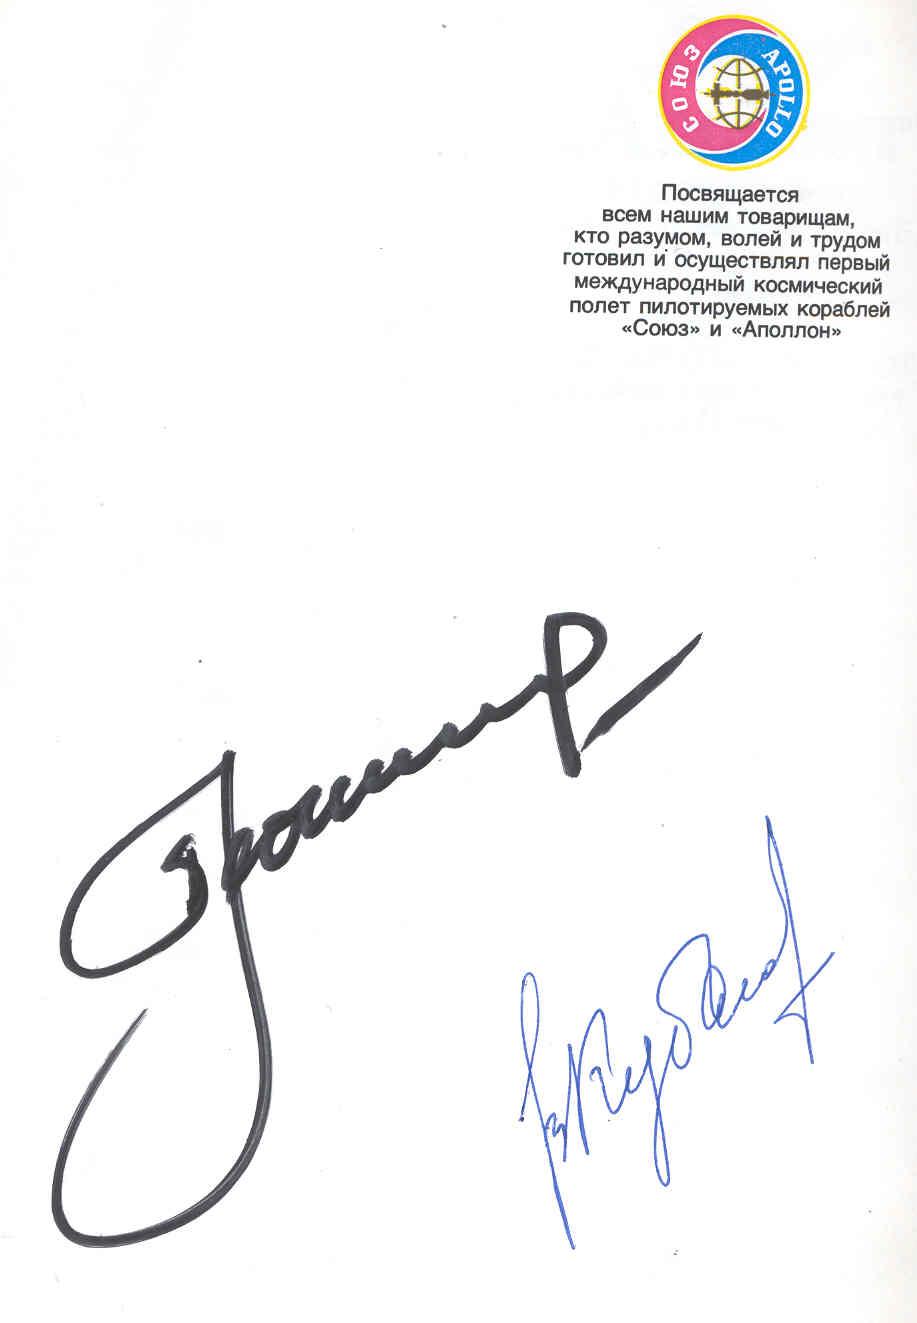 # cb100            Soyuz & Apollo book signed by Leonov and Kubasov 2